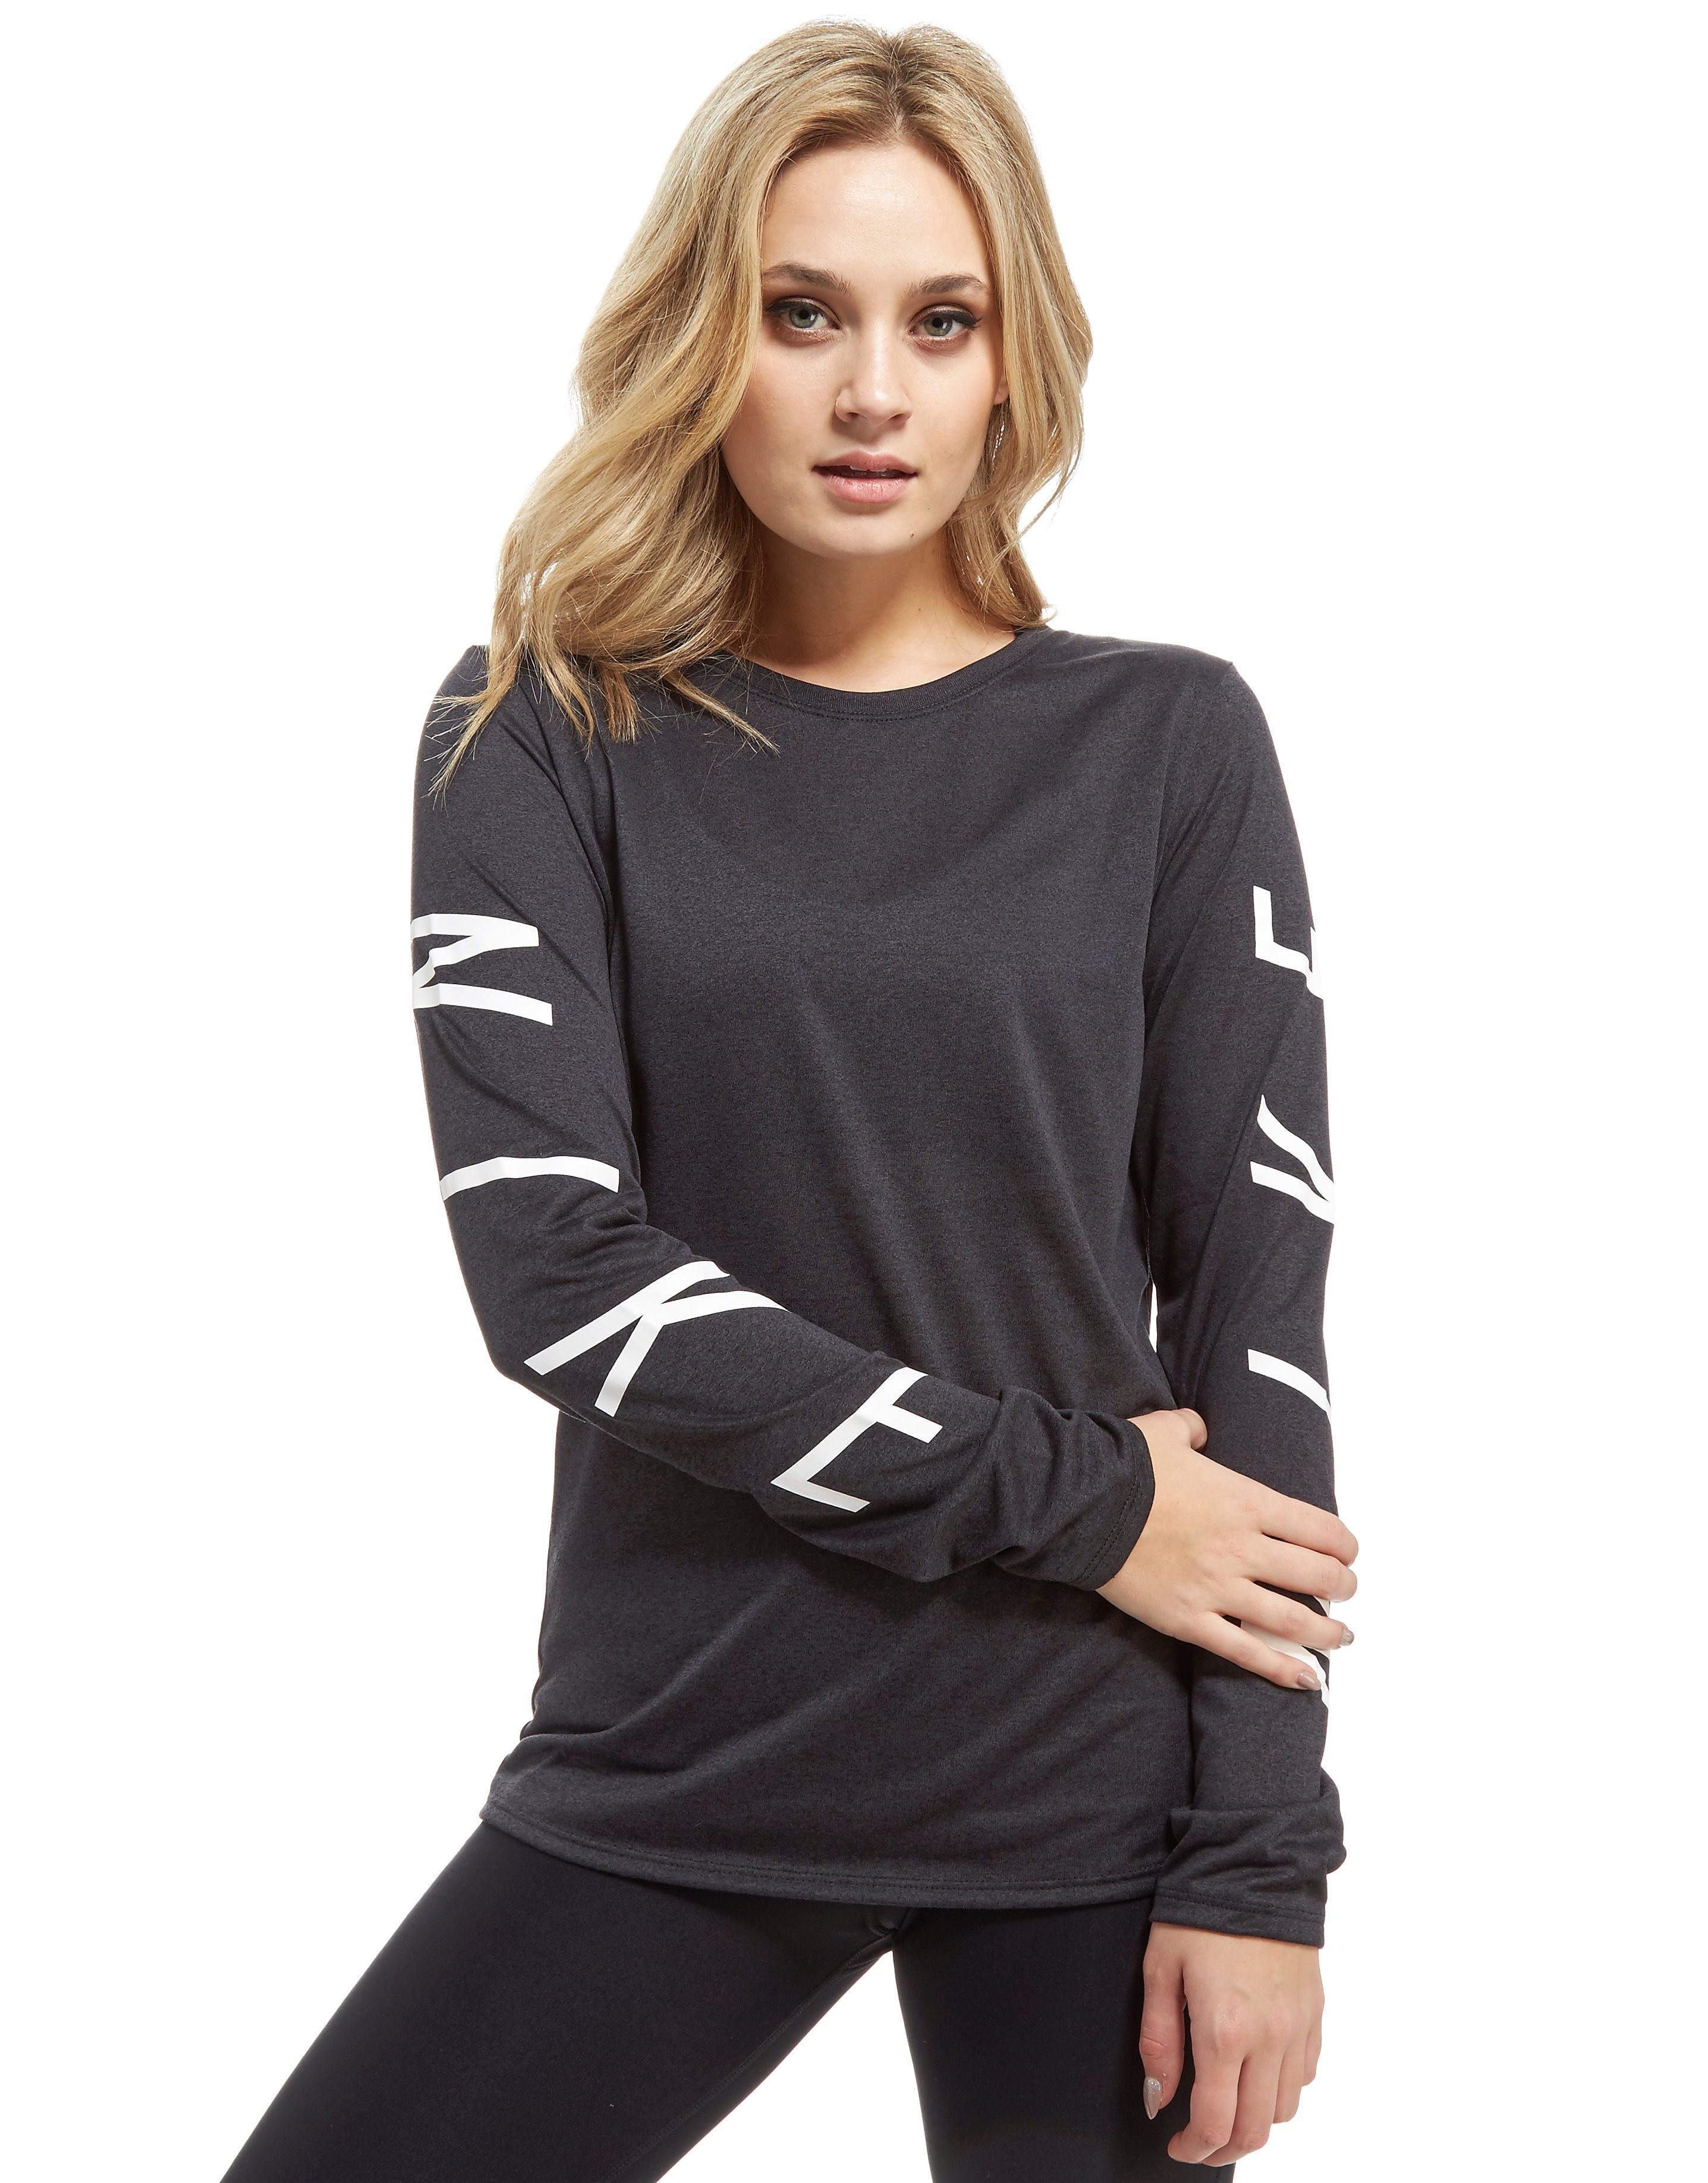 Nike Long Sleeve Legend Top